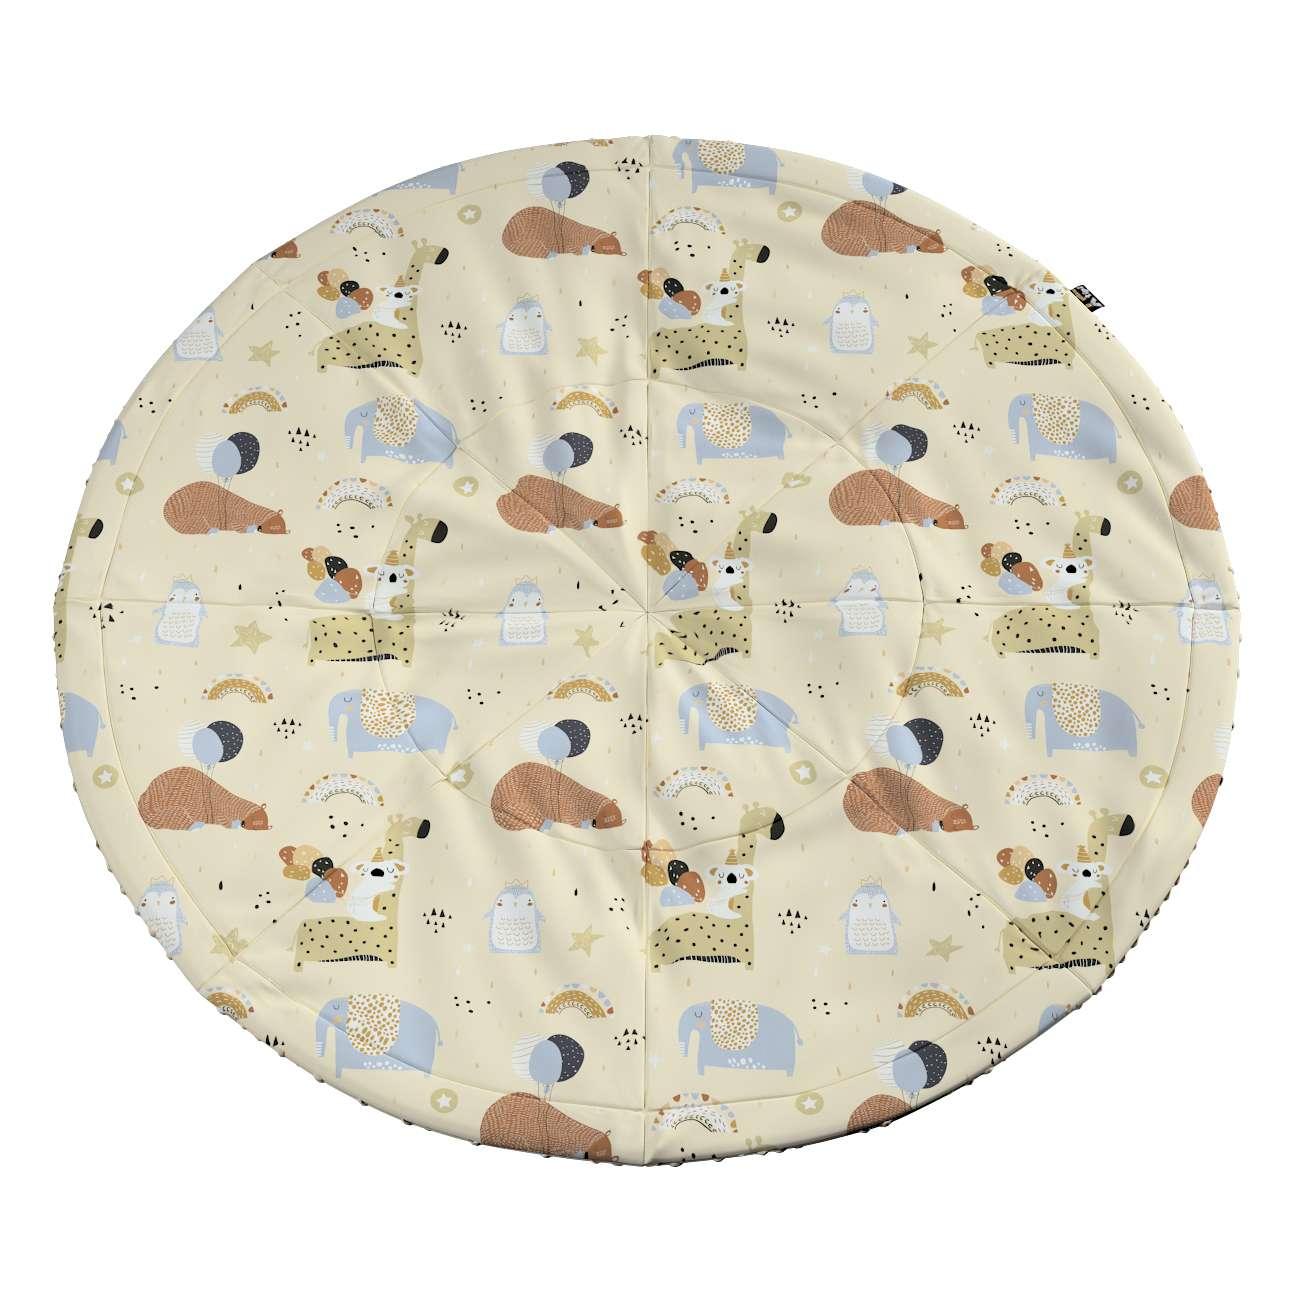 Apvalus kilimėlis kolekcijoje Magic Collection, audinys: 500-46